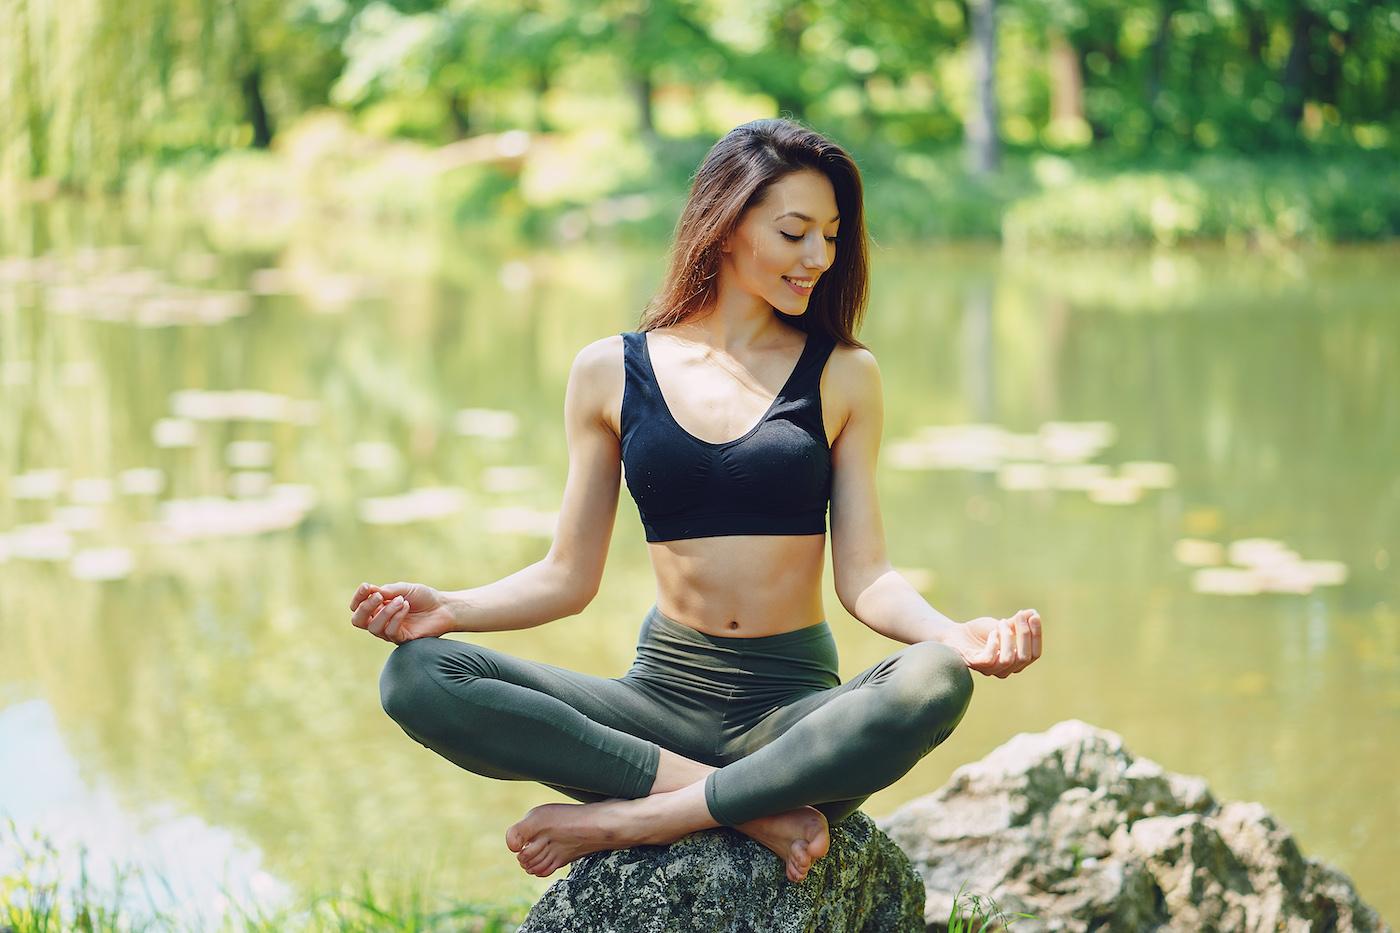 5 Ways Yoga Can Build Strength